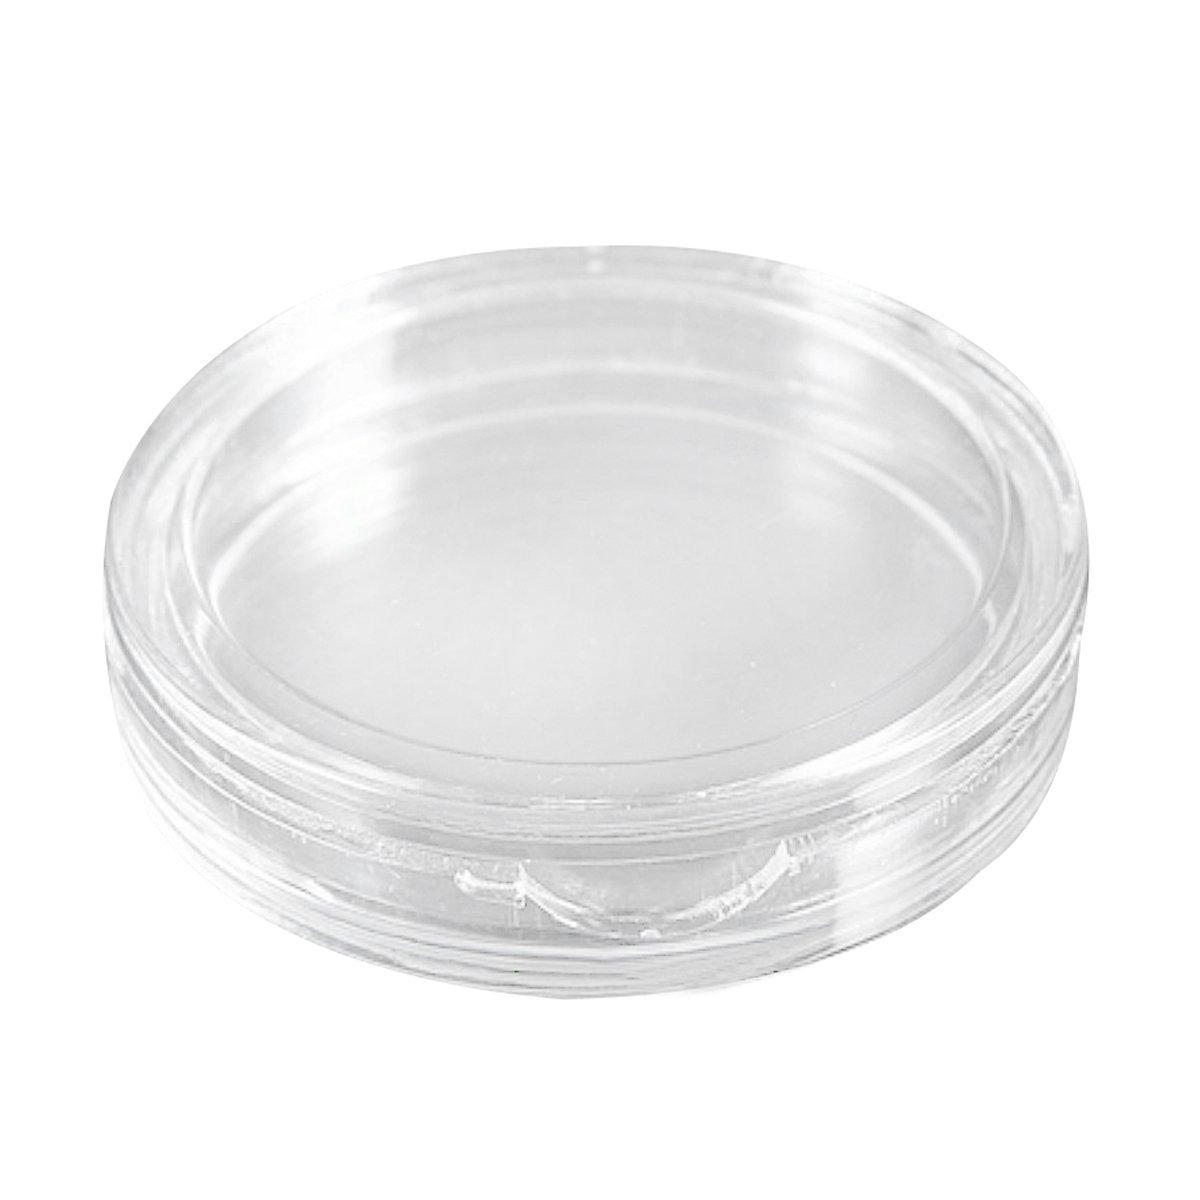 SODIAL(R) 10 pcs Small round transparent plastic coin capsules box 35mm